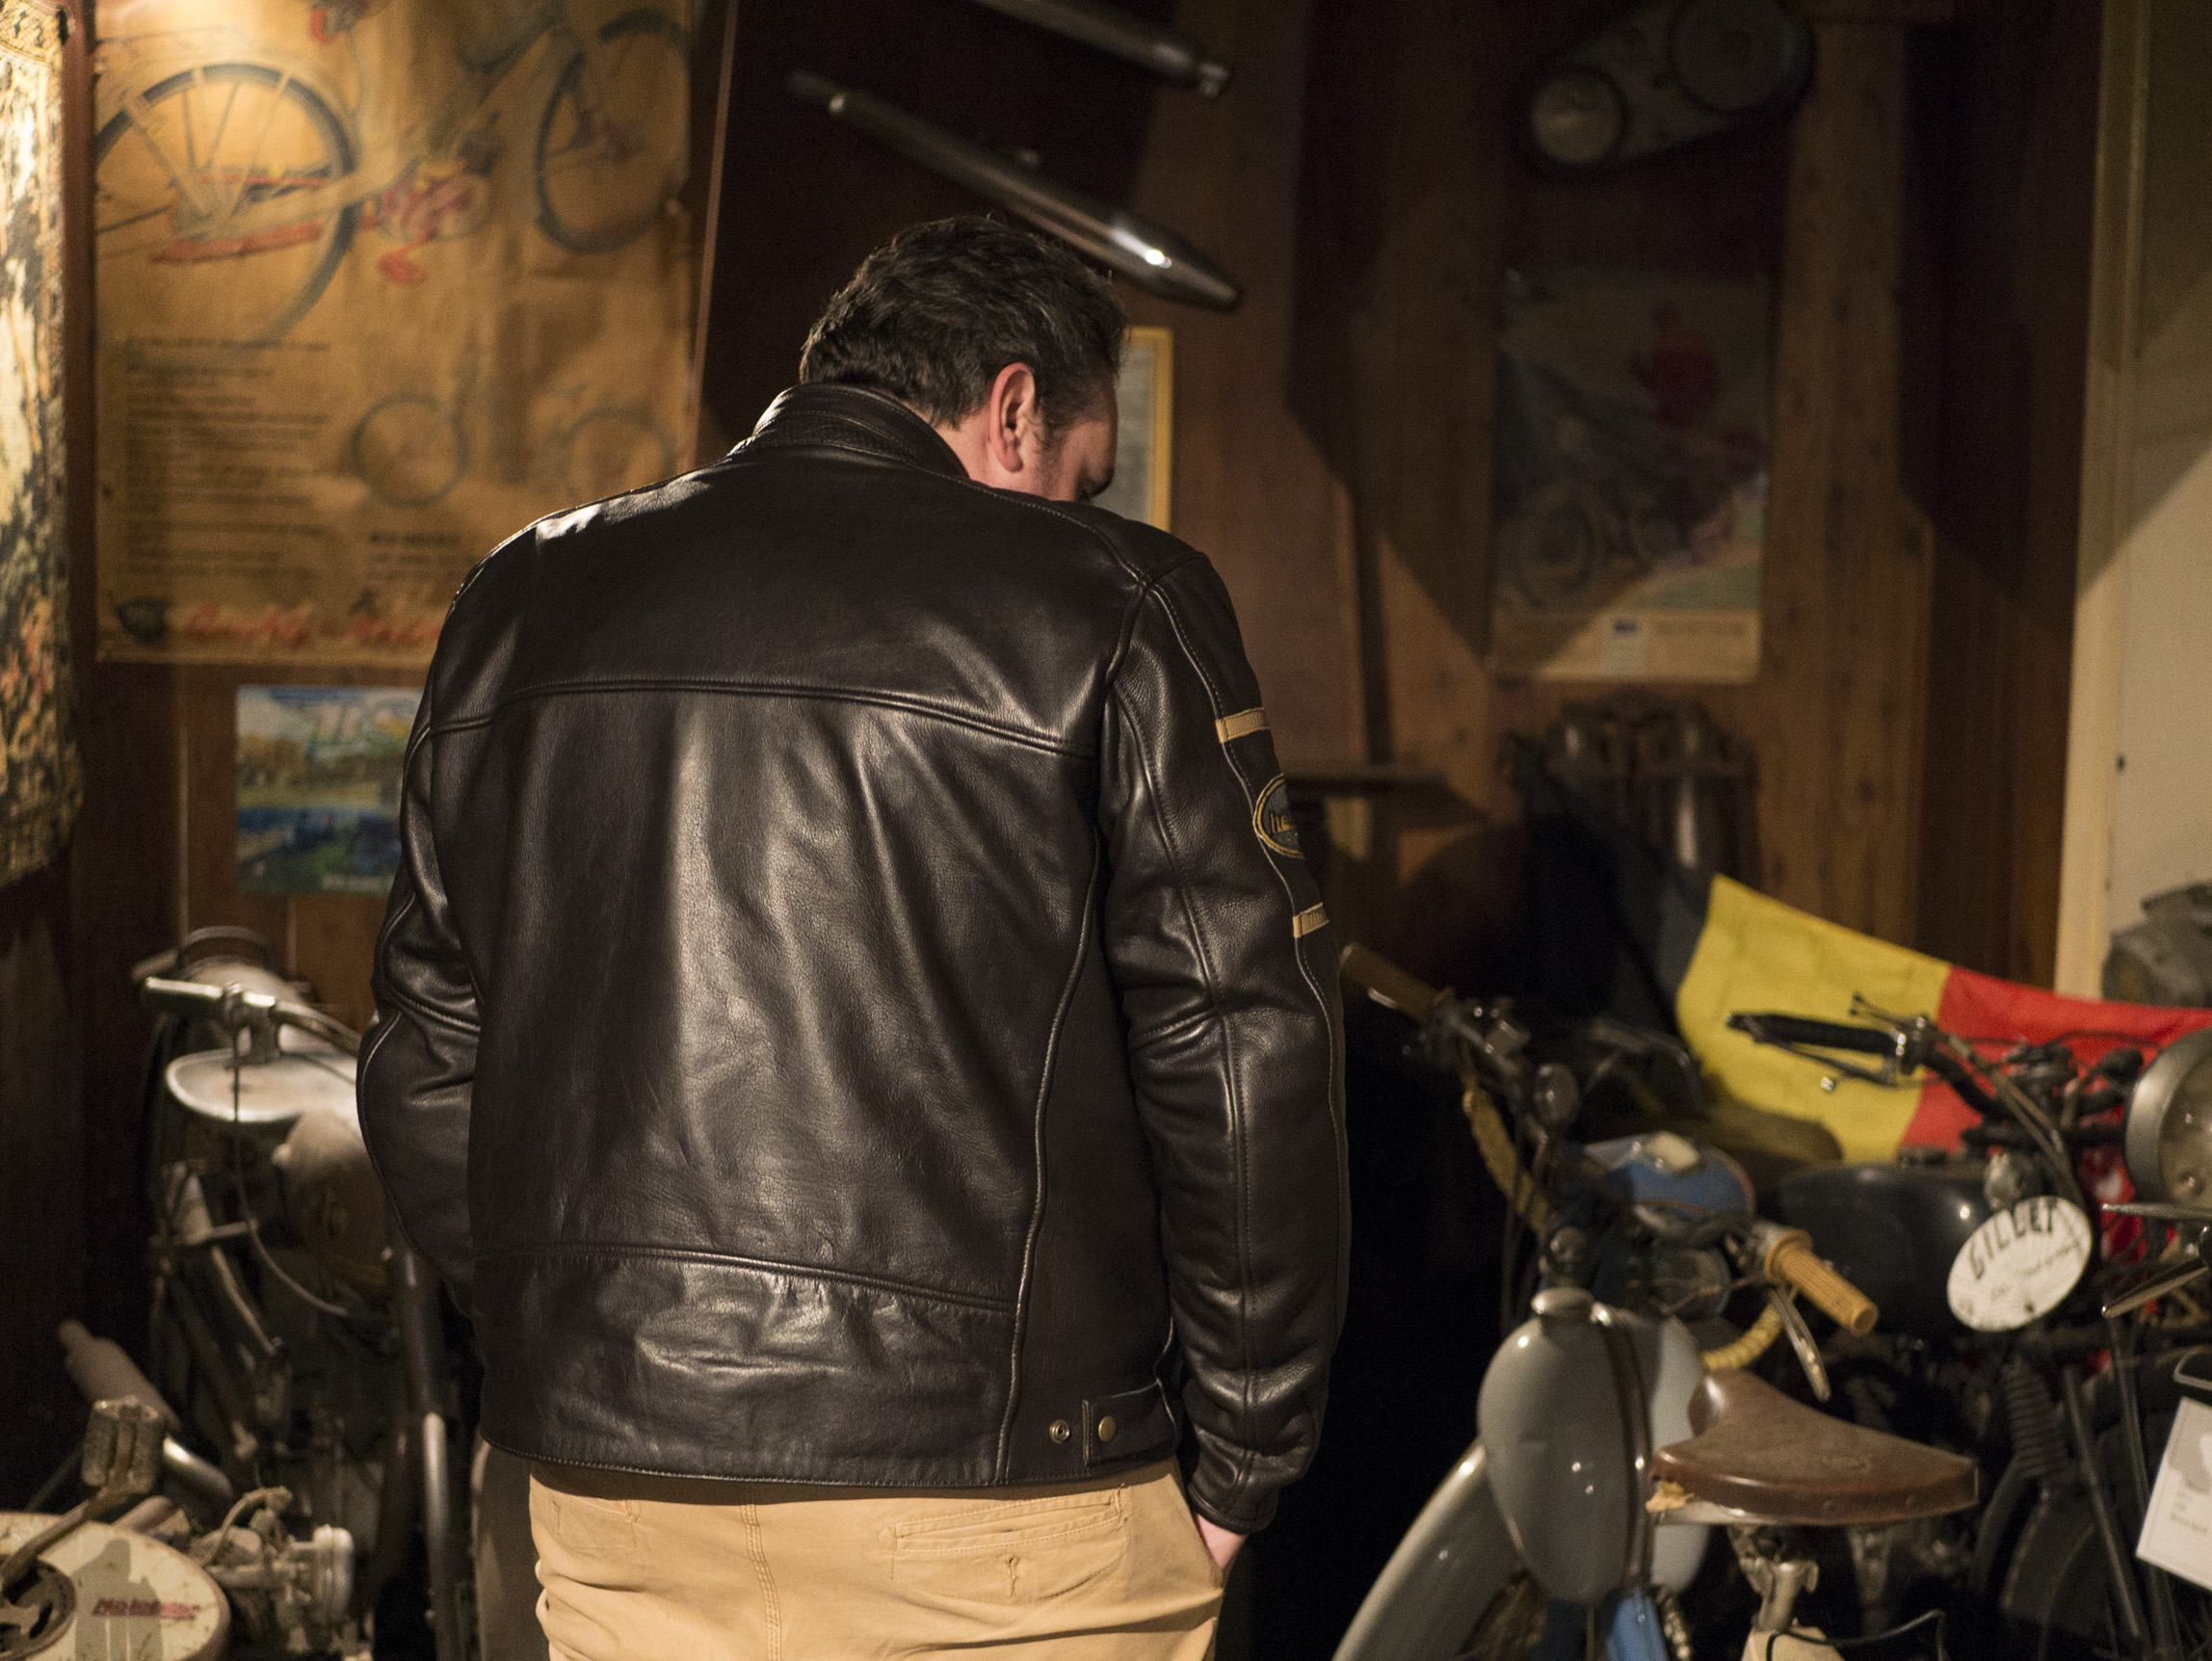 Vista posterior de la chaqueta de cuero de la marca Helstons Benji Fender